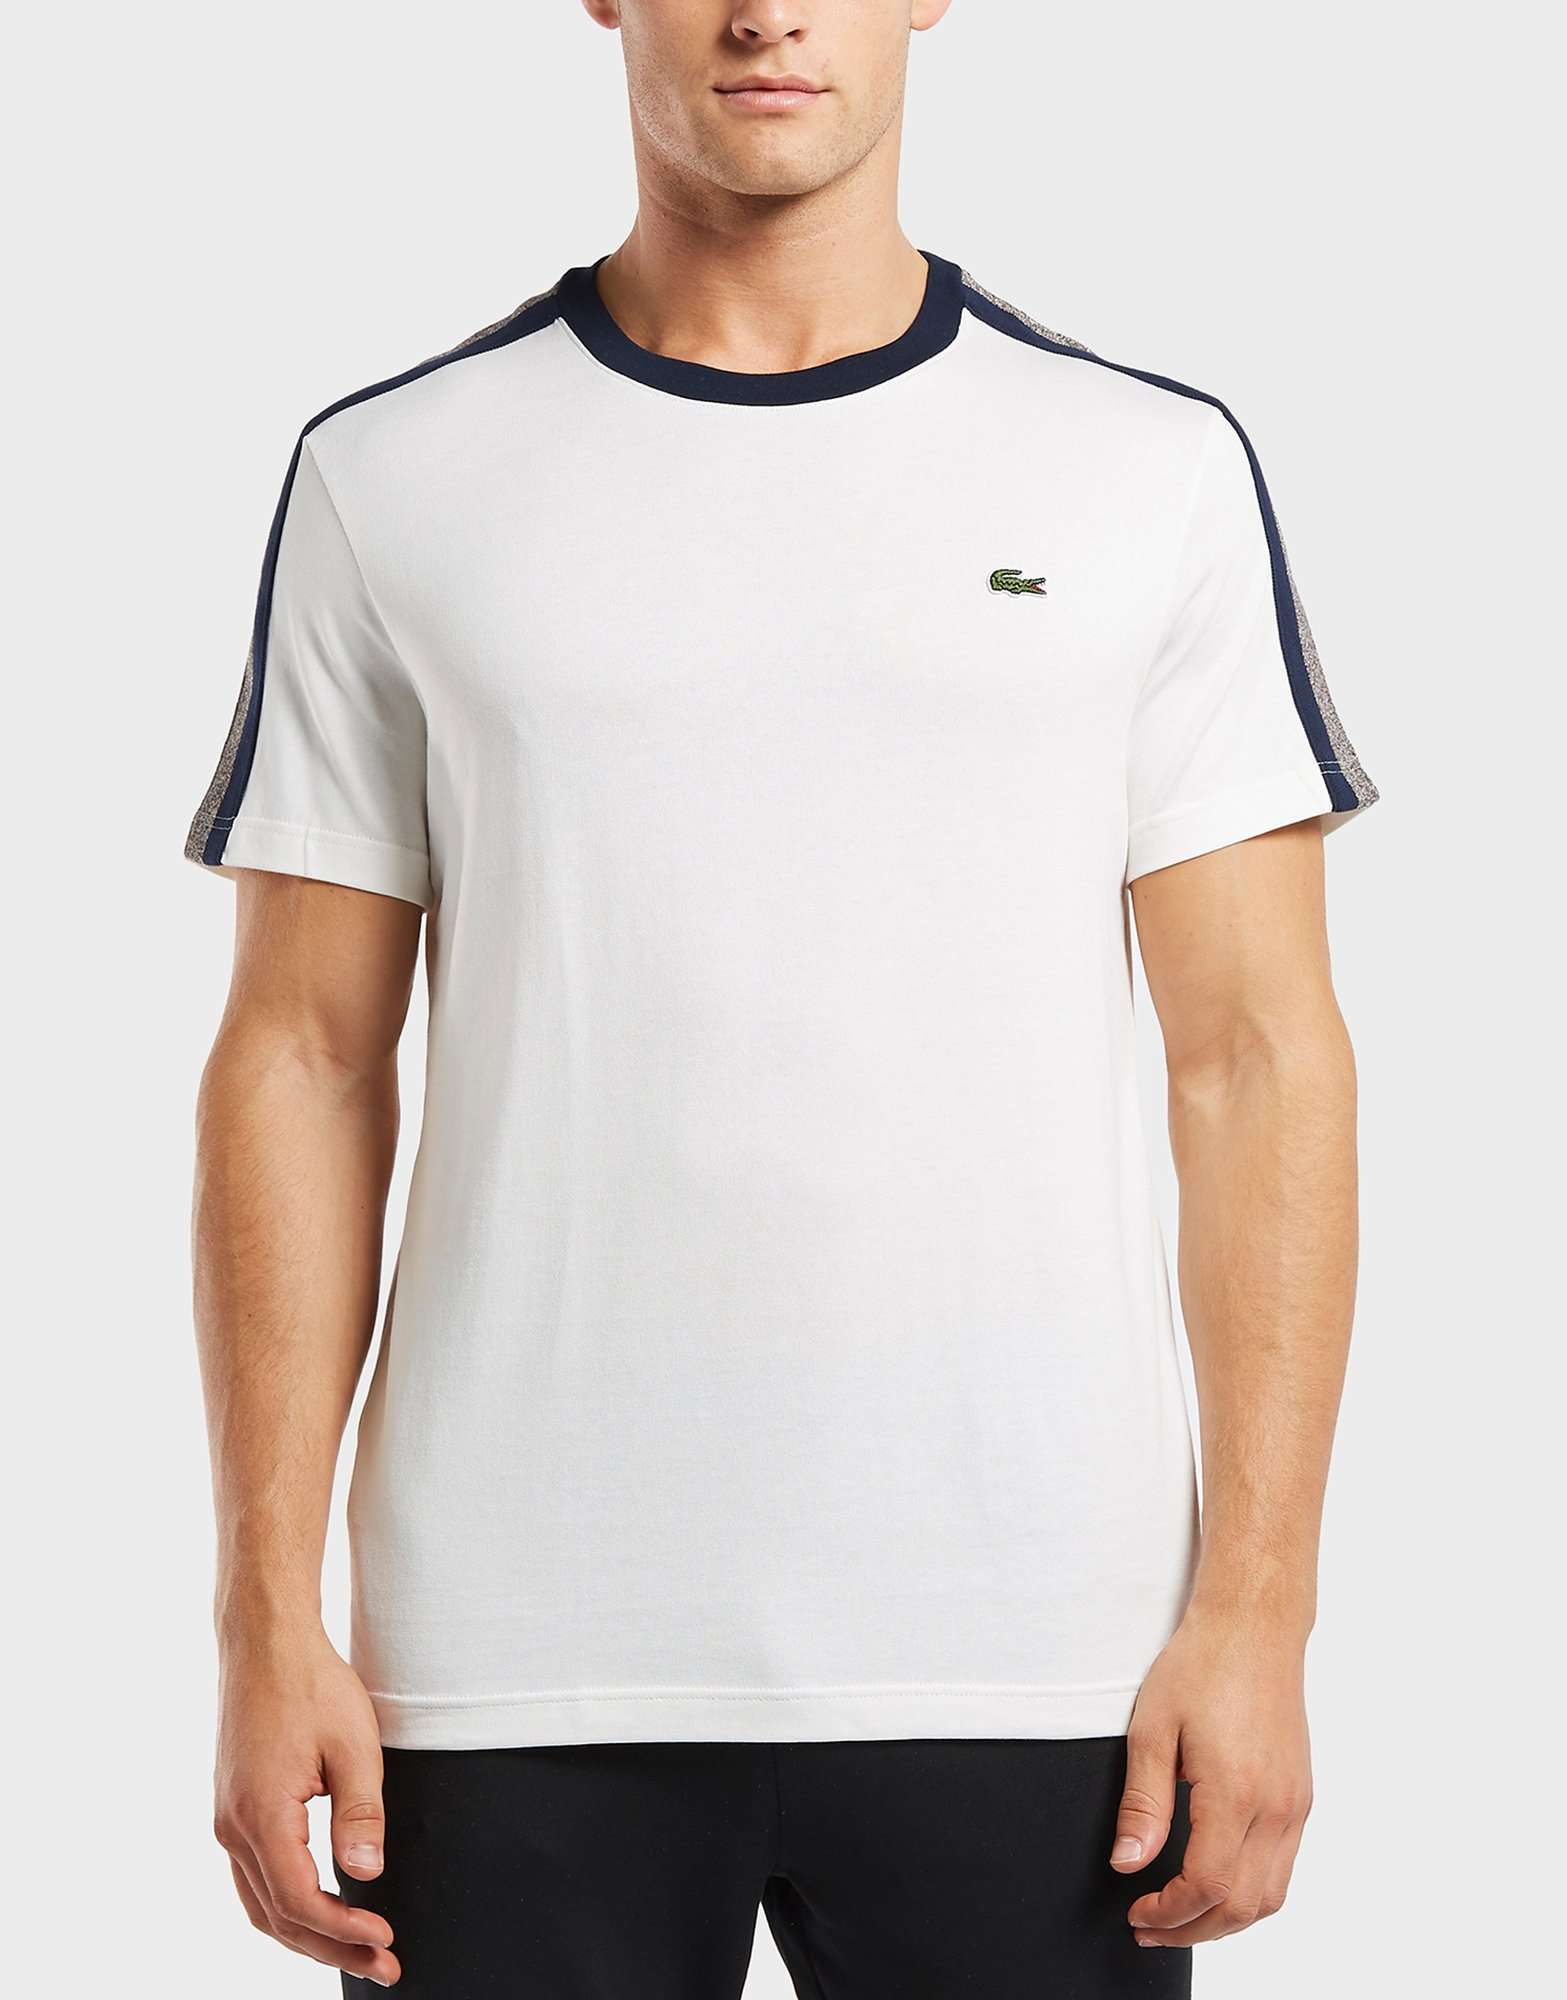 Lacoste Tape Stripe Short Sleeve T-Shirt